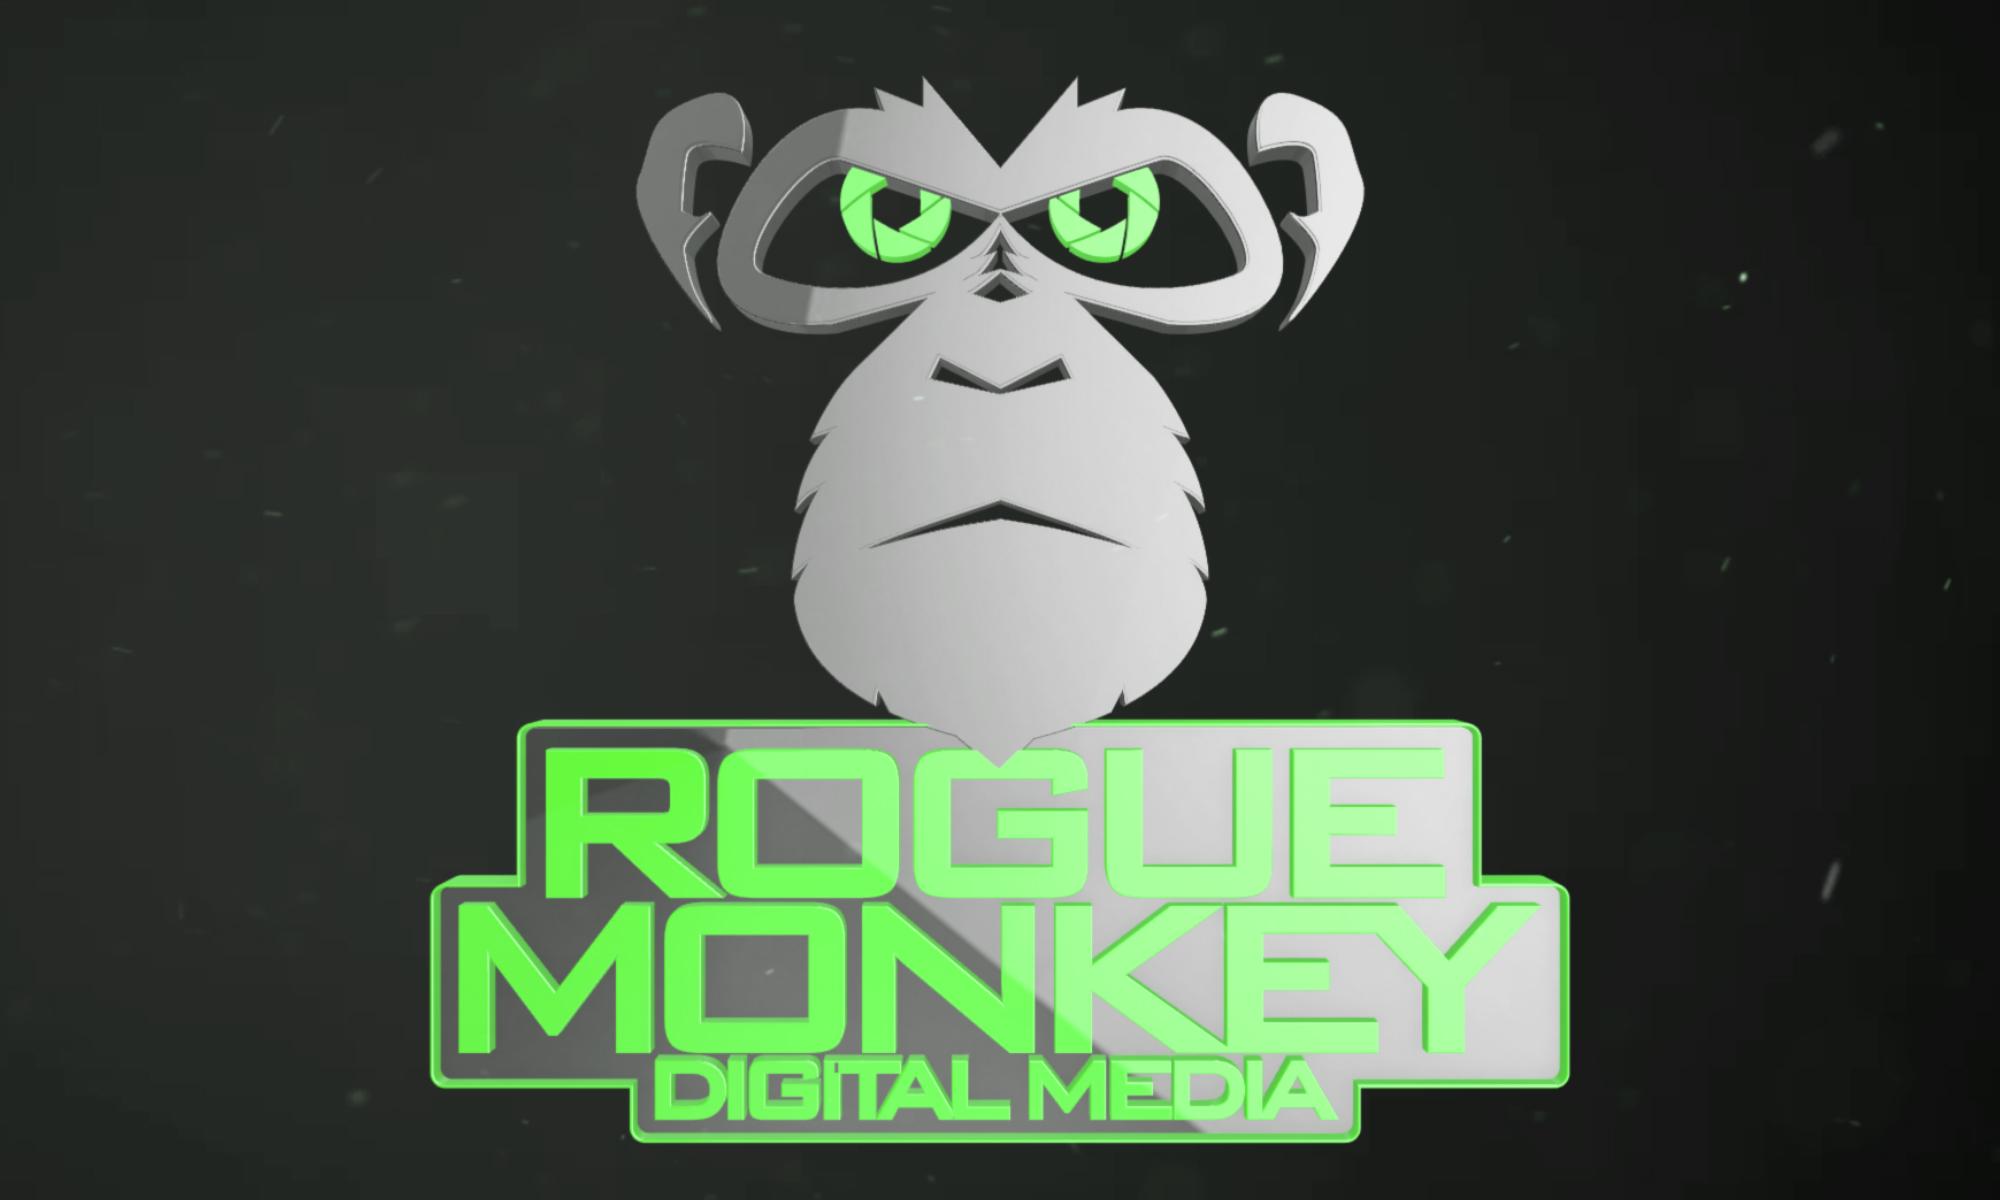 Rogue Monkey Digital Media